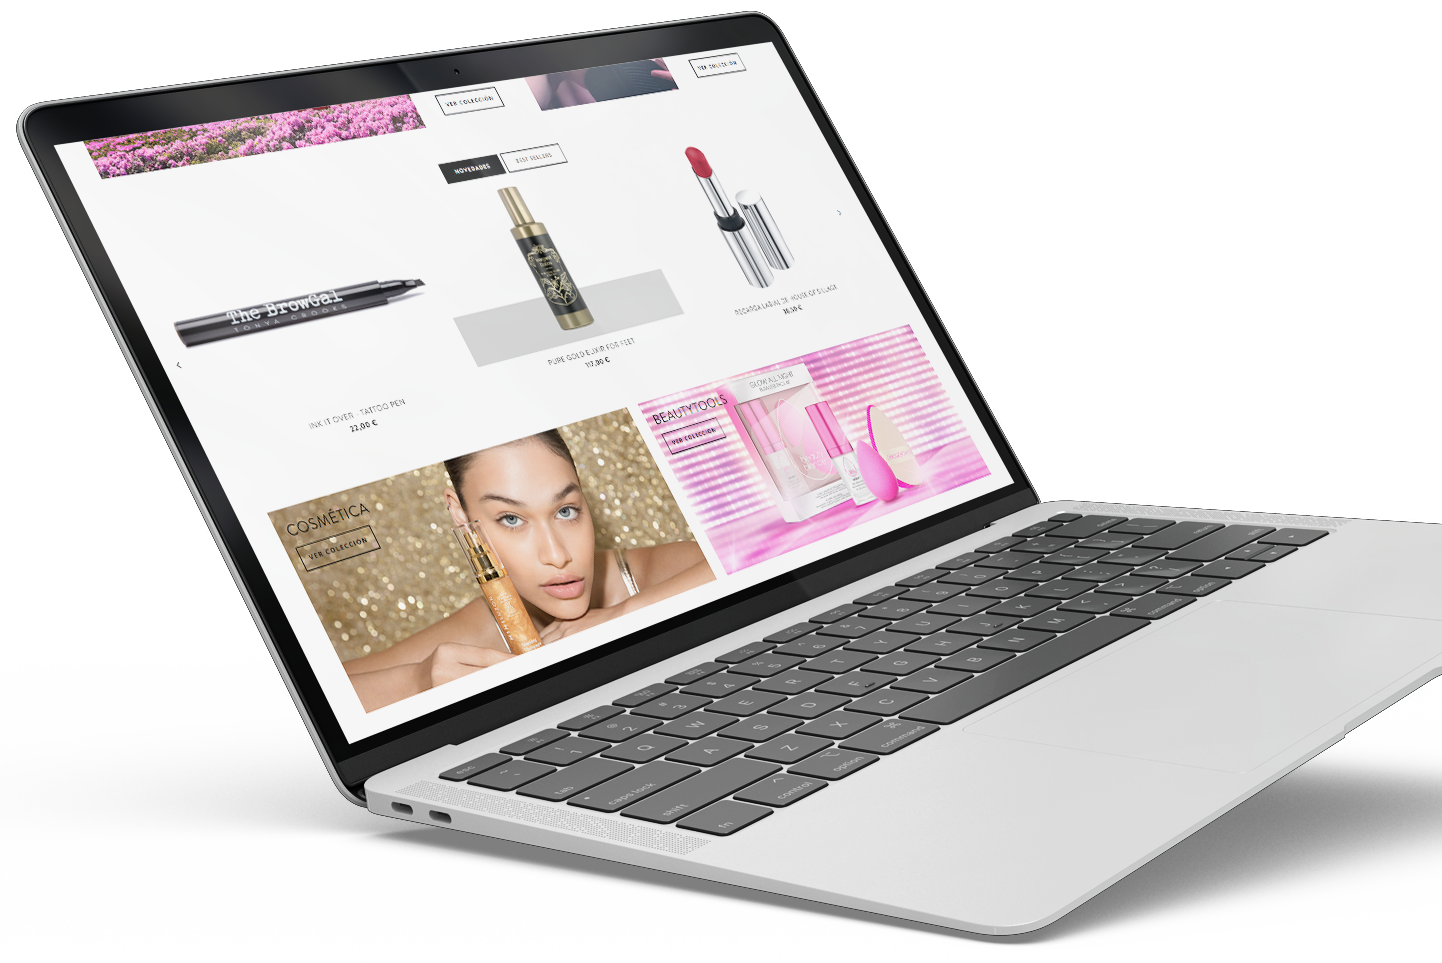 ikio shop desktop1